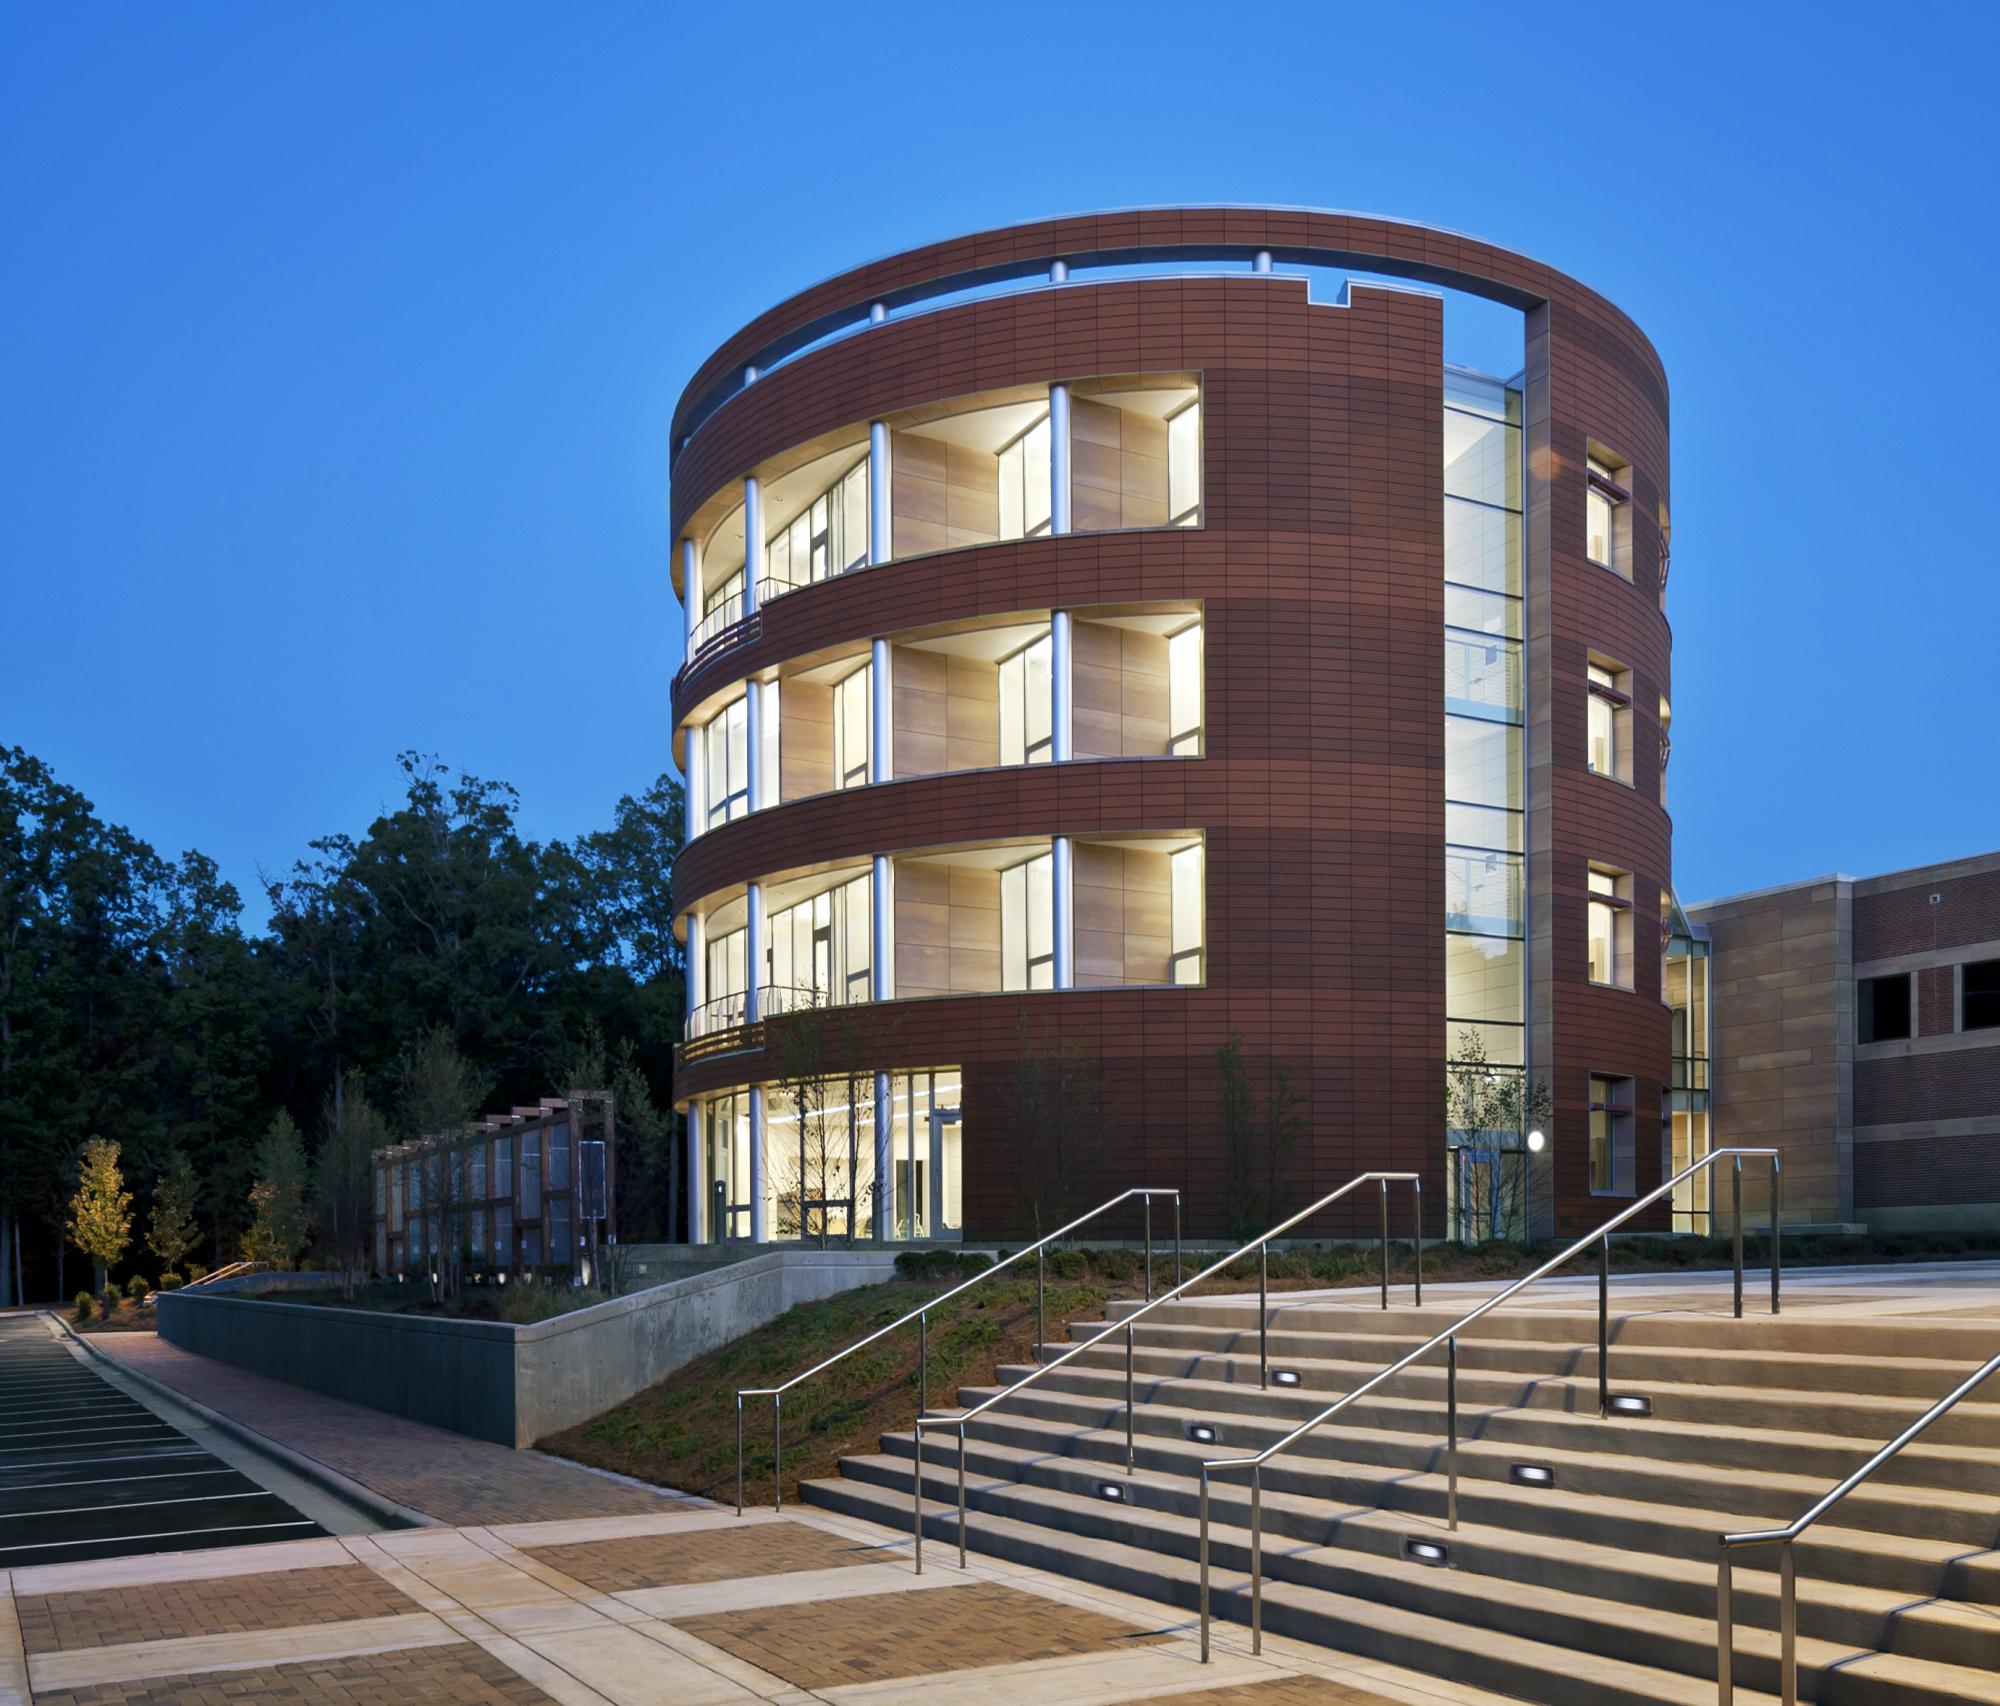 North Carolina Biotechnology Center photo rotunda